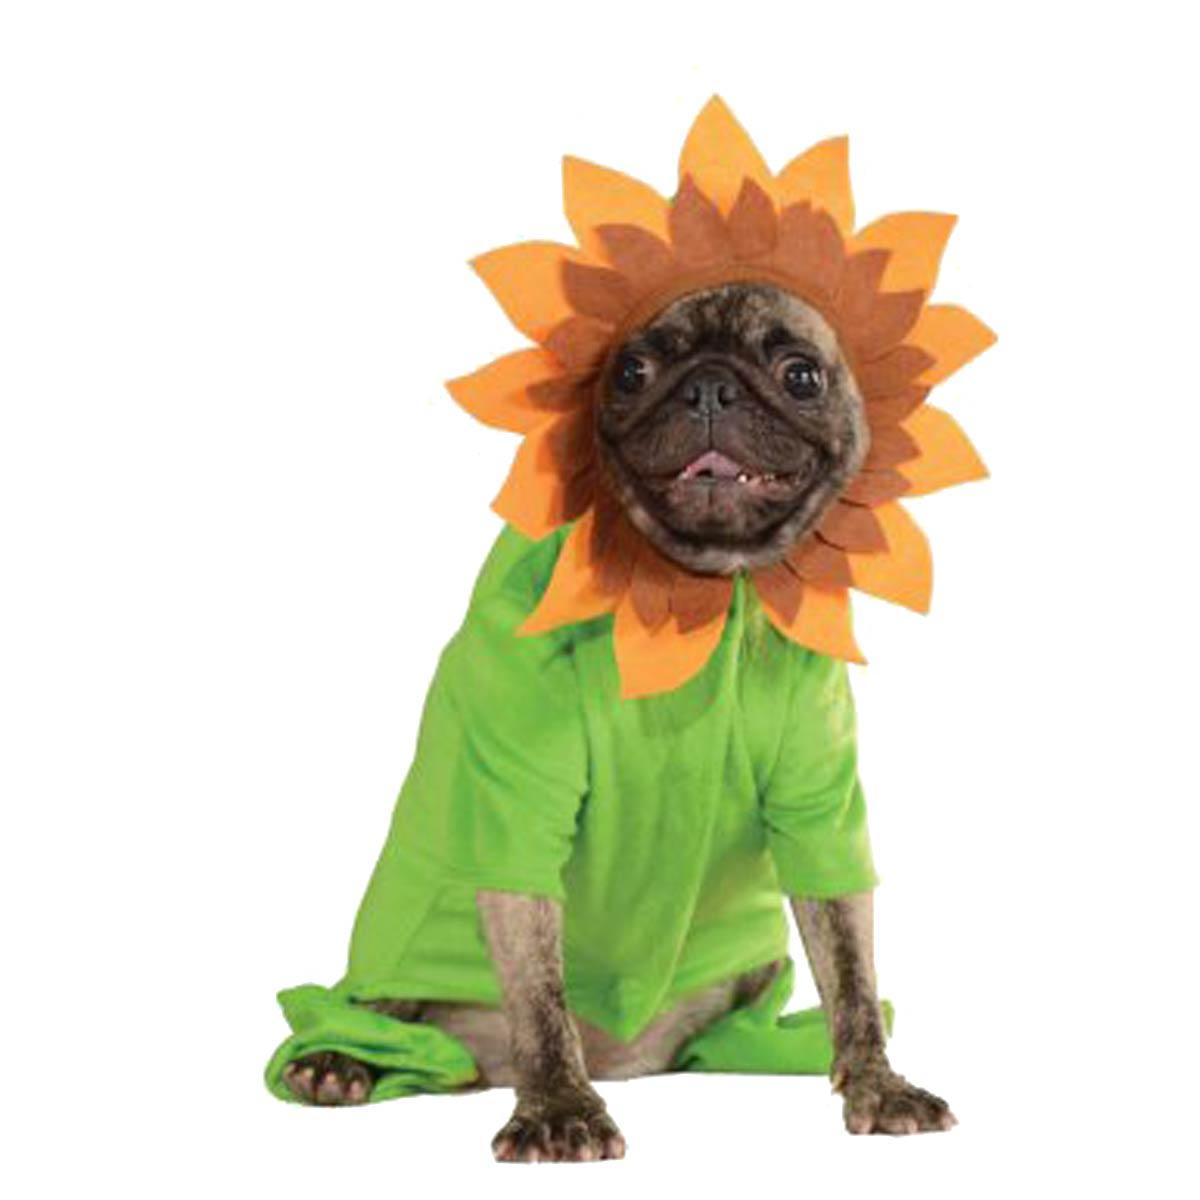 Sweet Sunflower Dog Costume